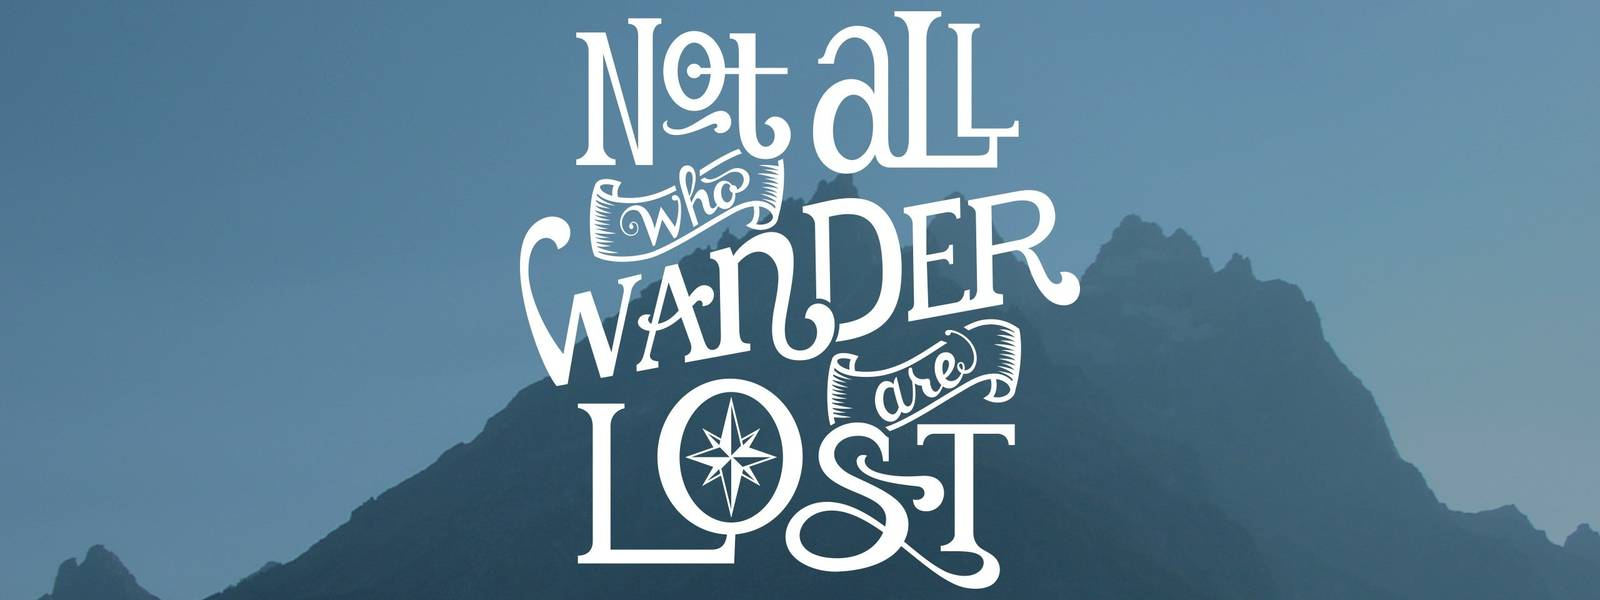 wanderlust 2